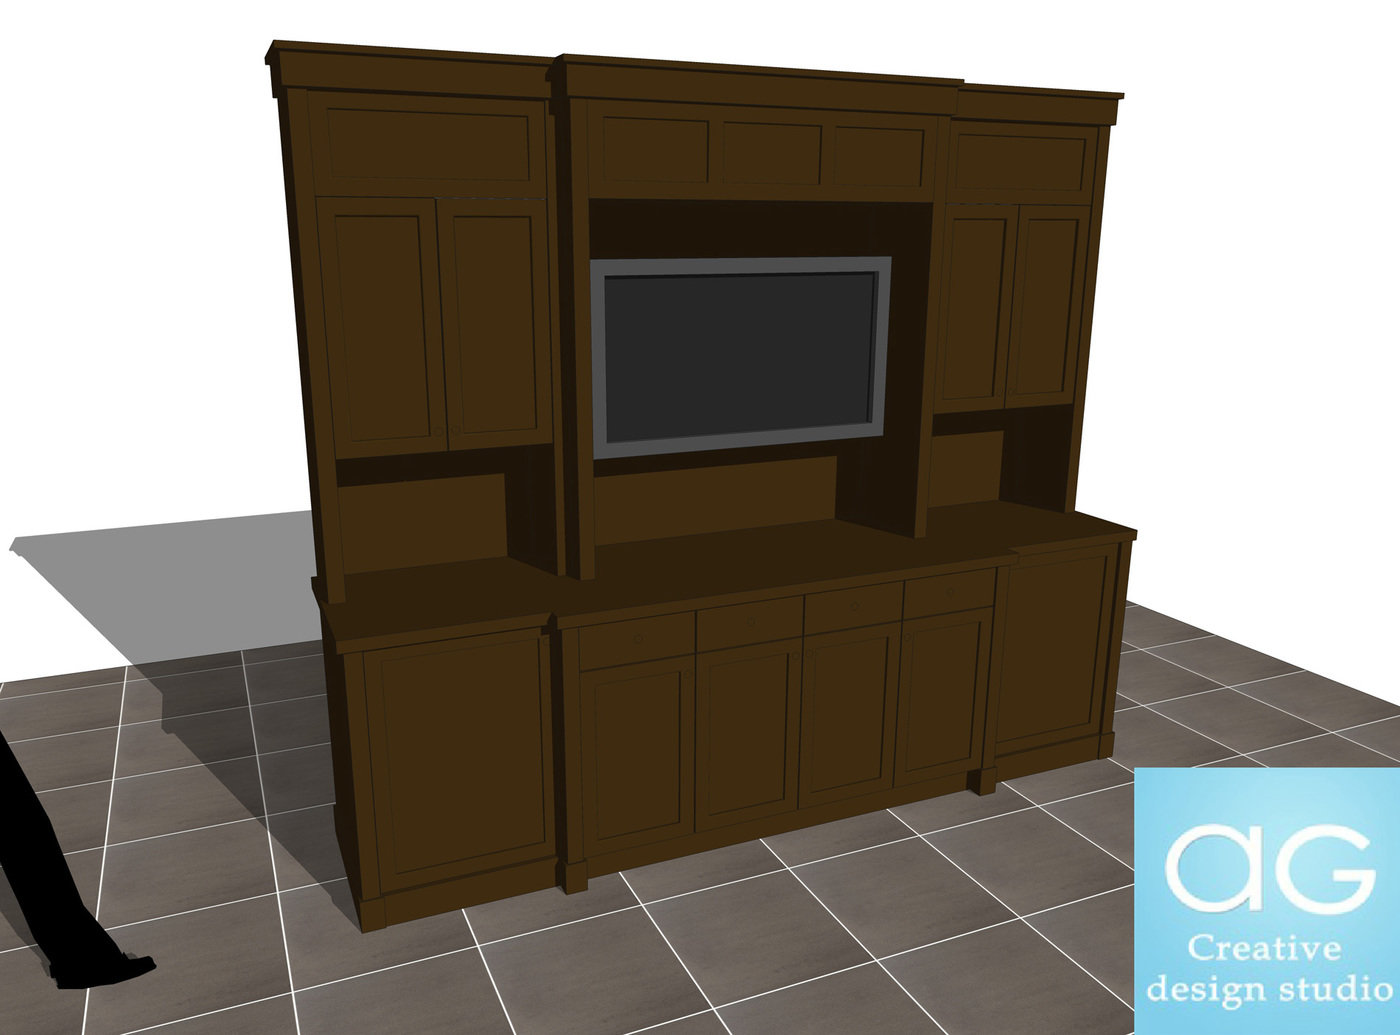 Interior Design Free SketchUp Models by AG CAD Designs at